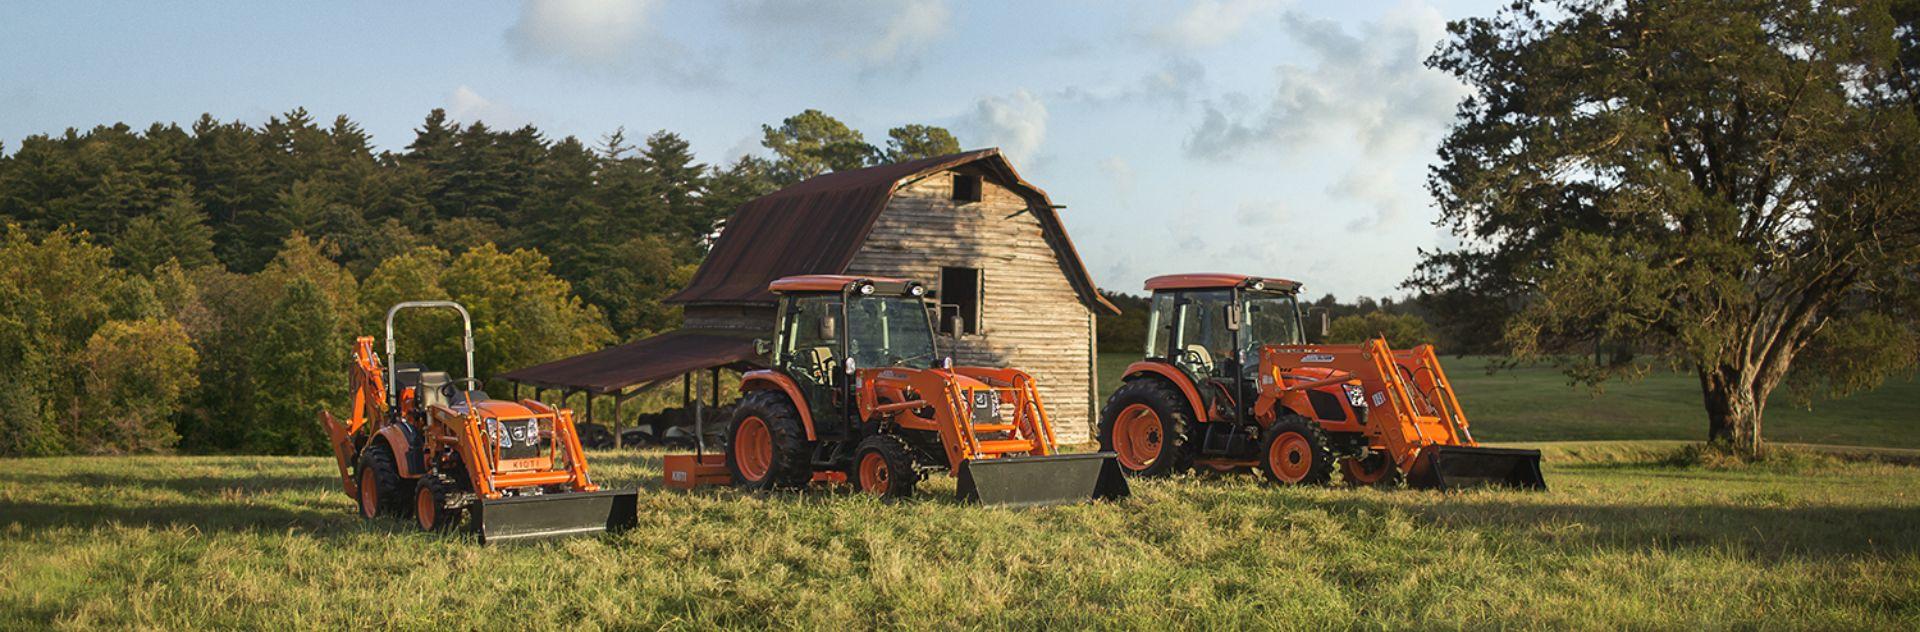 Home S & W Tractor Carson City, NV (775) 882-1225